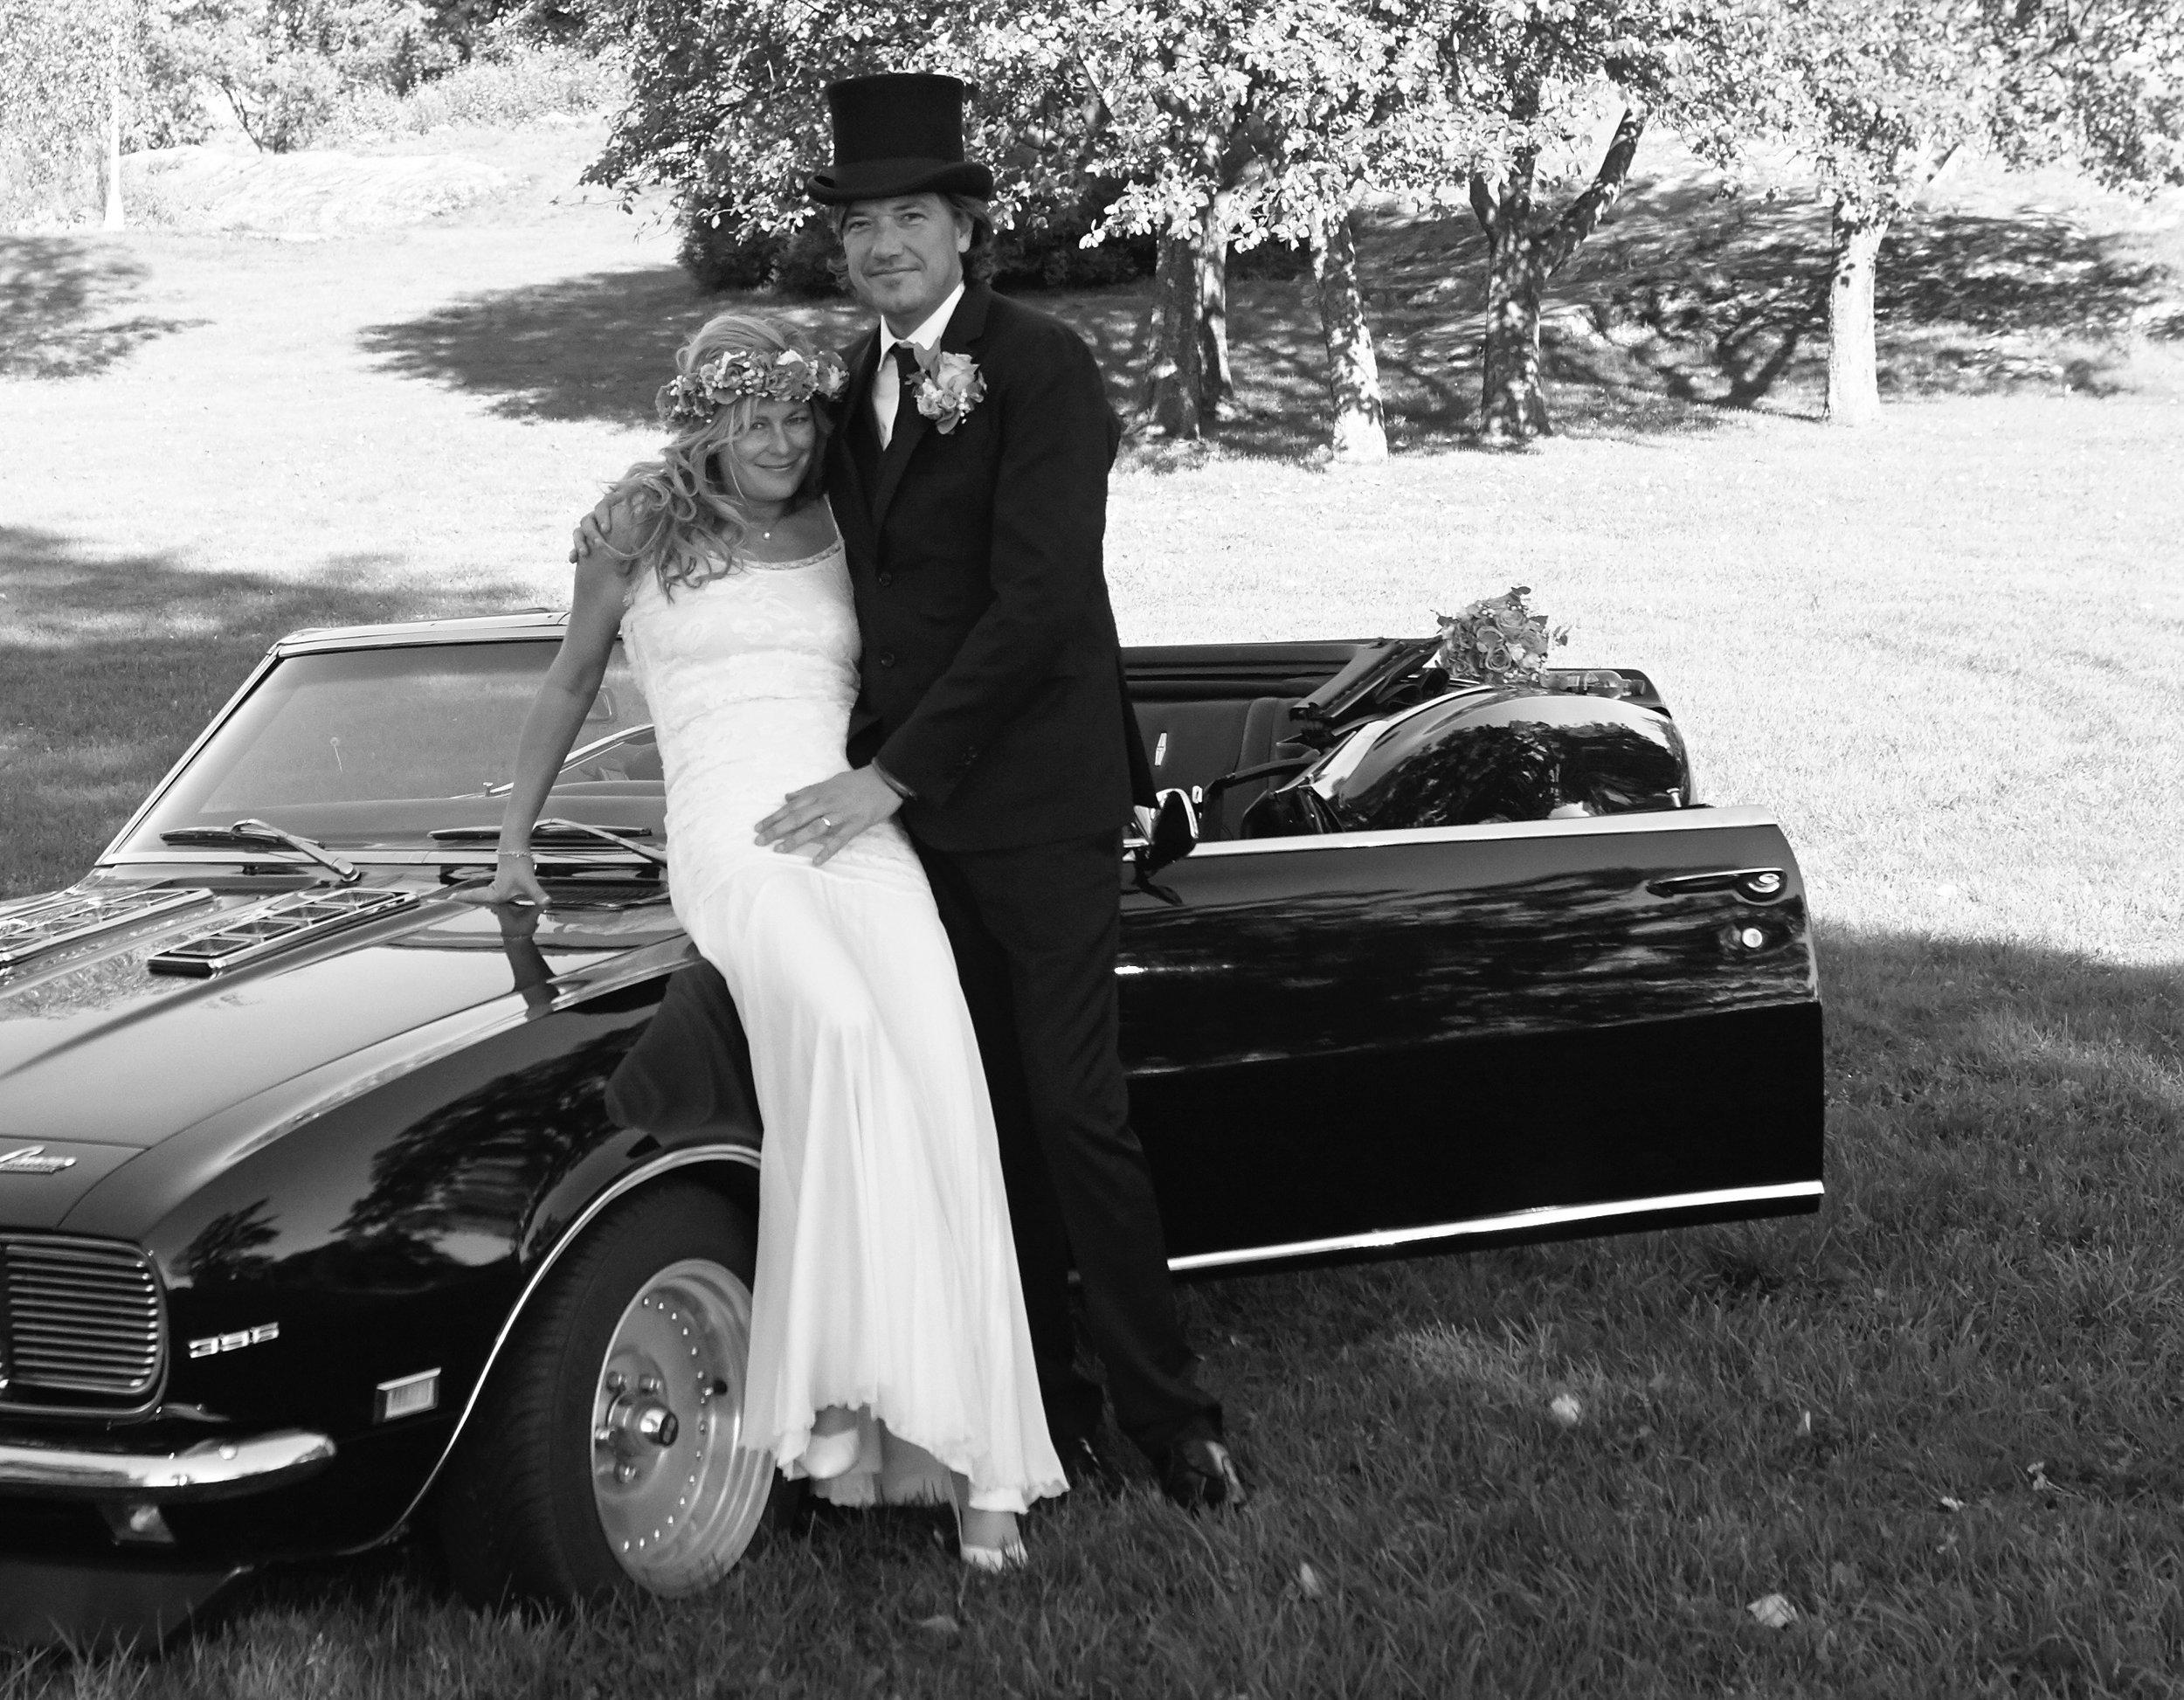 lone bryllup 299.jpg